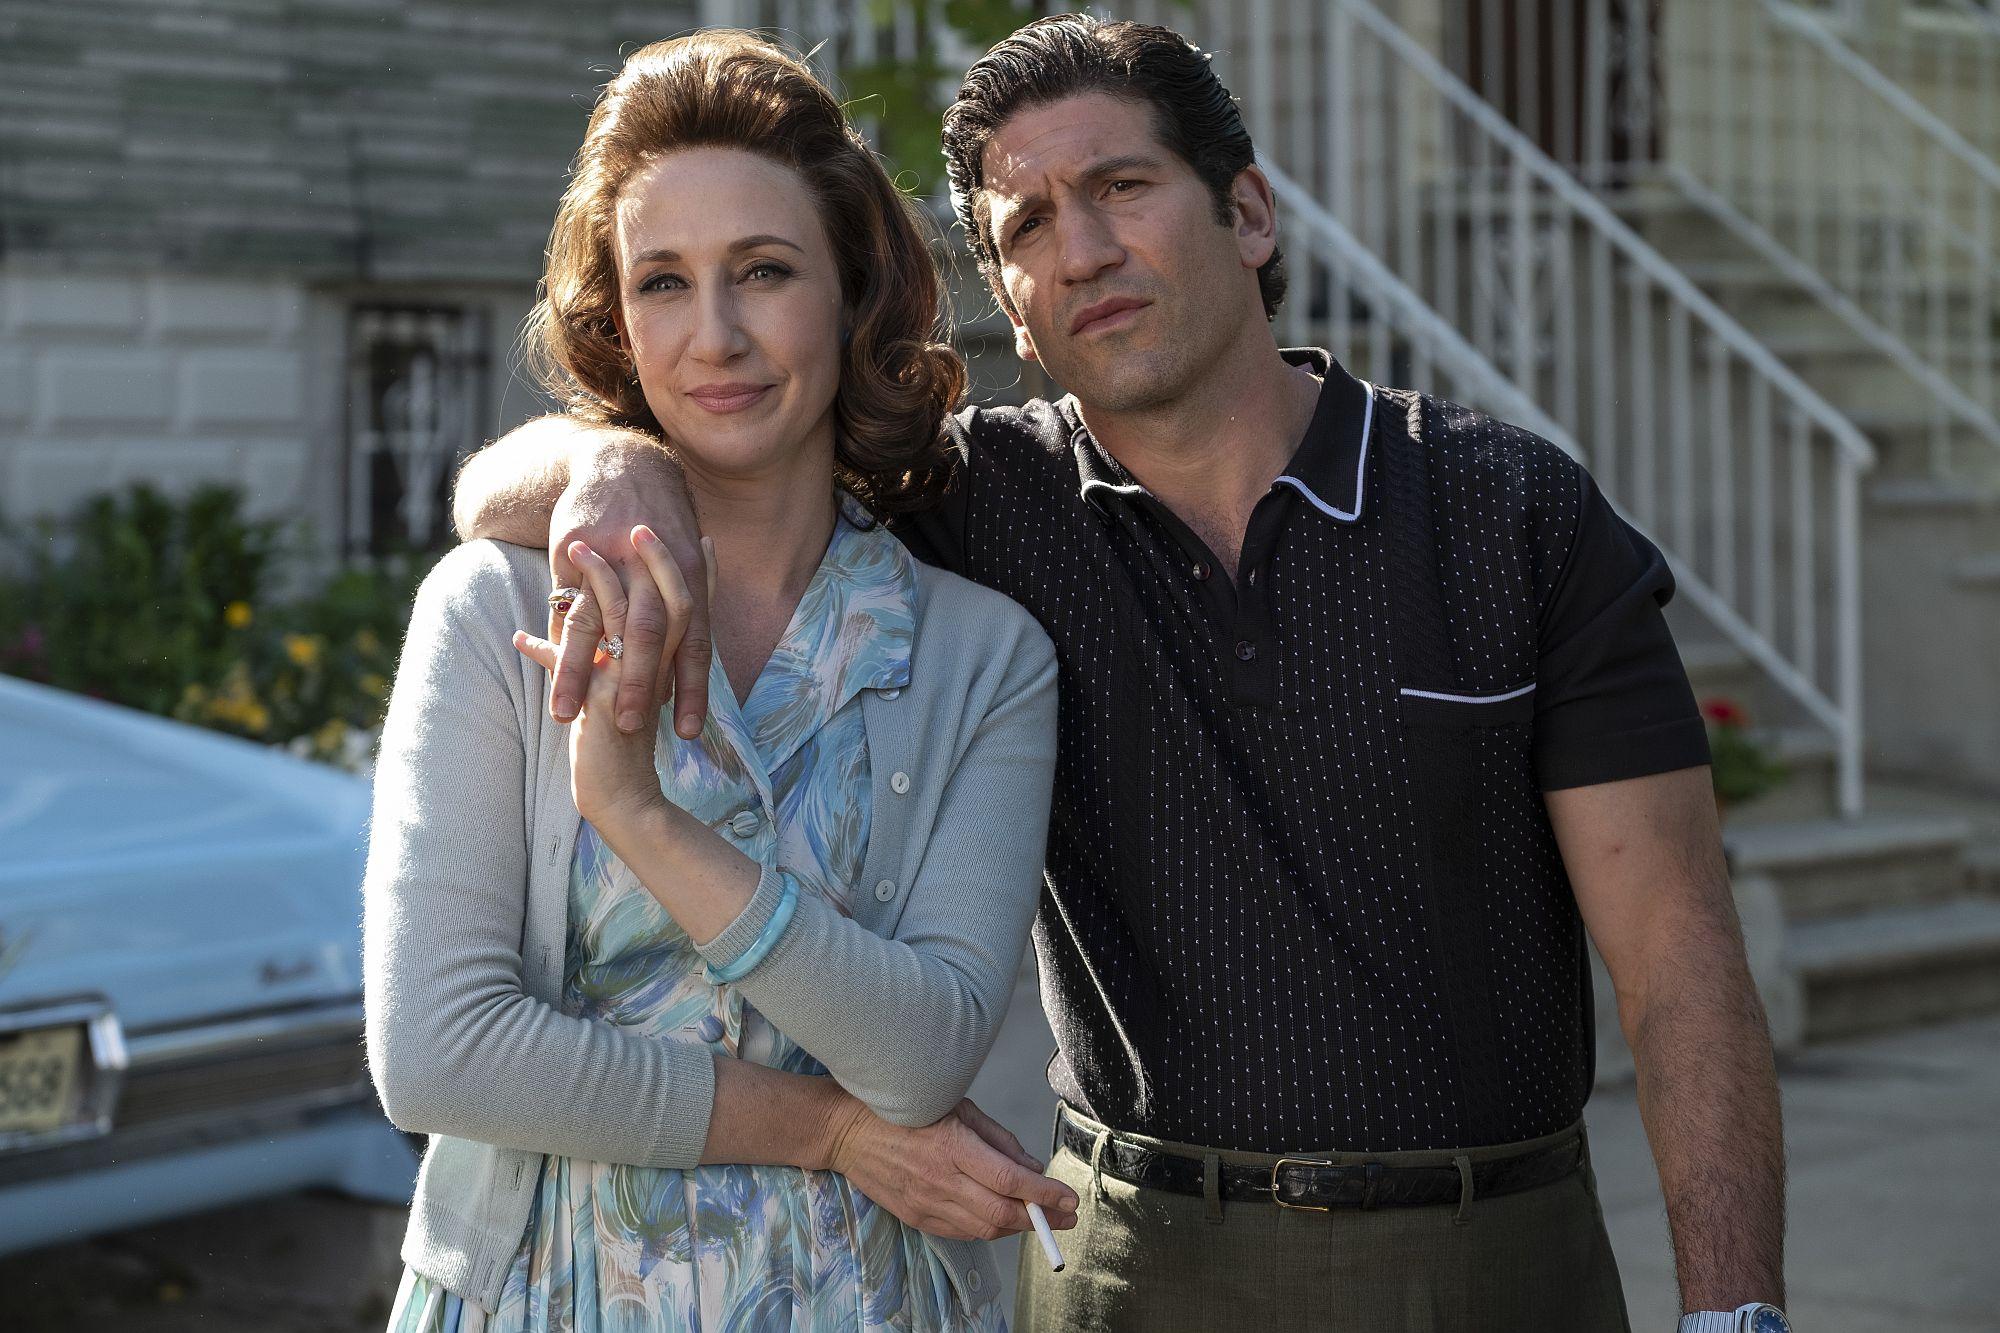 (L-r) VERA FARMIGA als Livia Soprano and JON BERNTHAL als Johnny Soprano